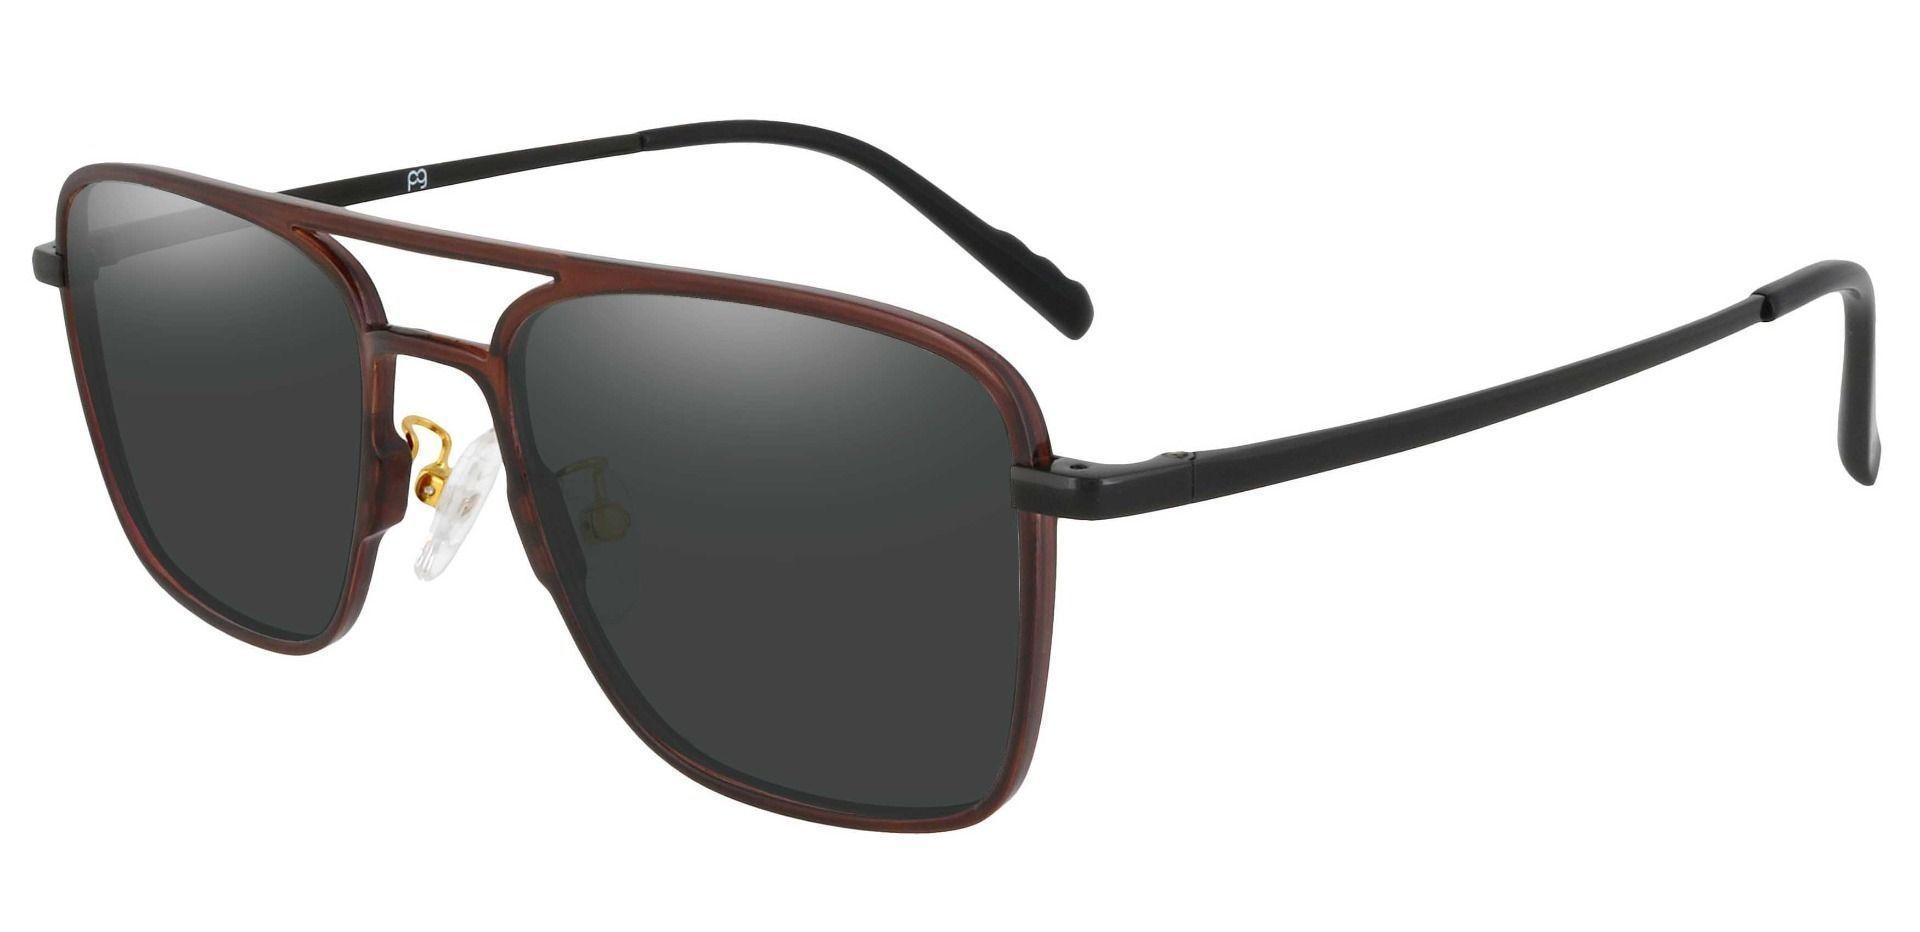 Largo Aviator Prescription Sunglasses - Brown Frame With Gray Lenses